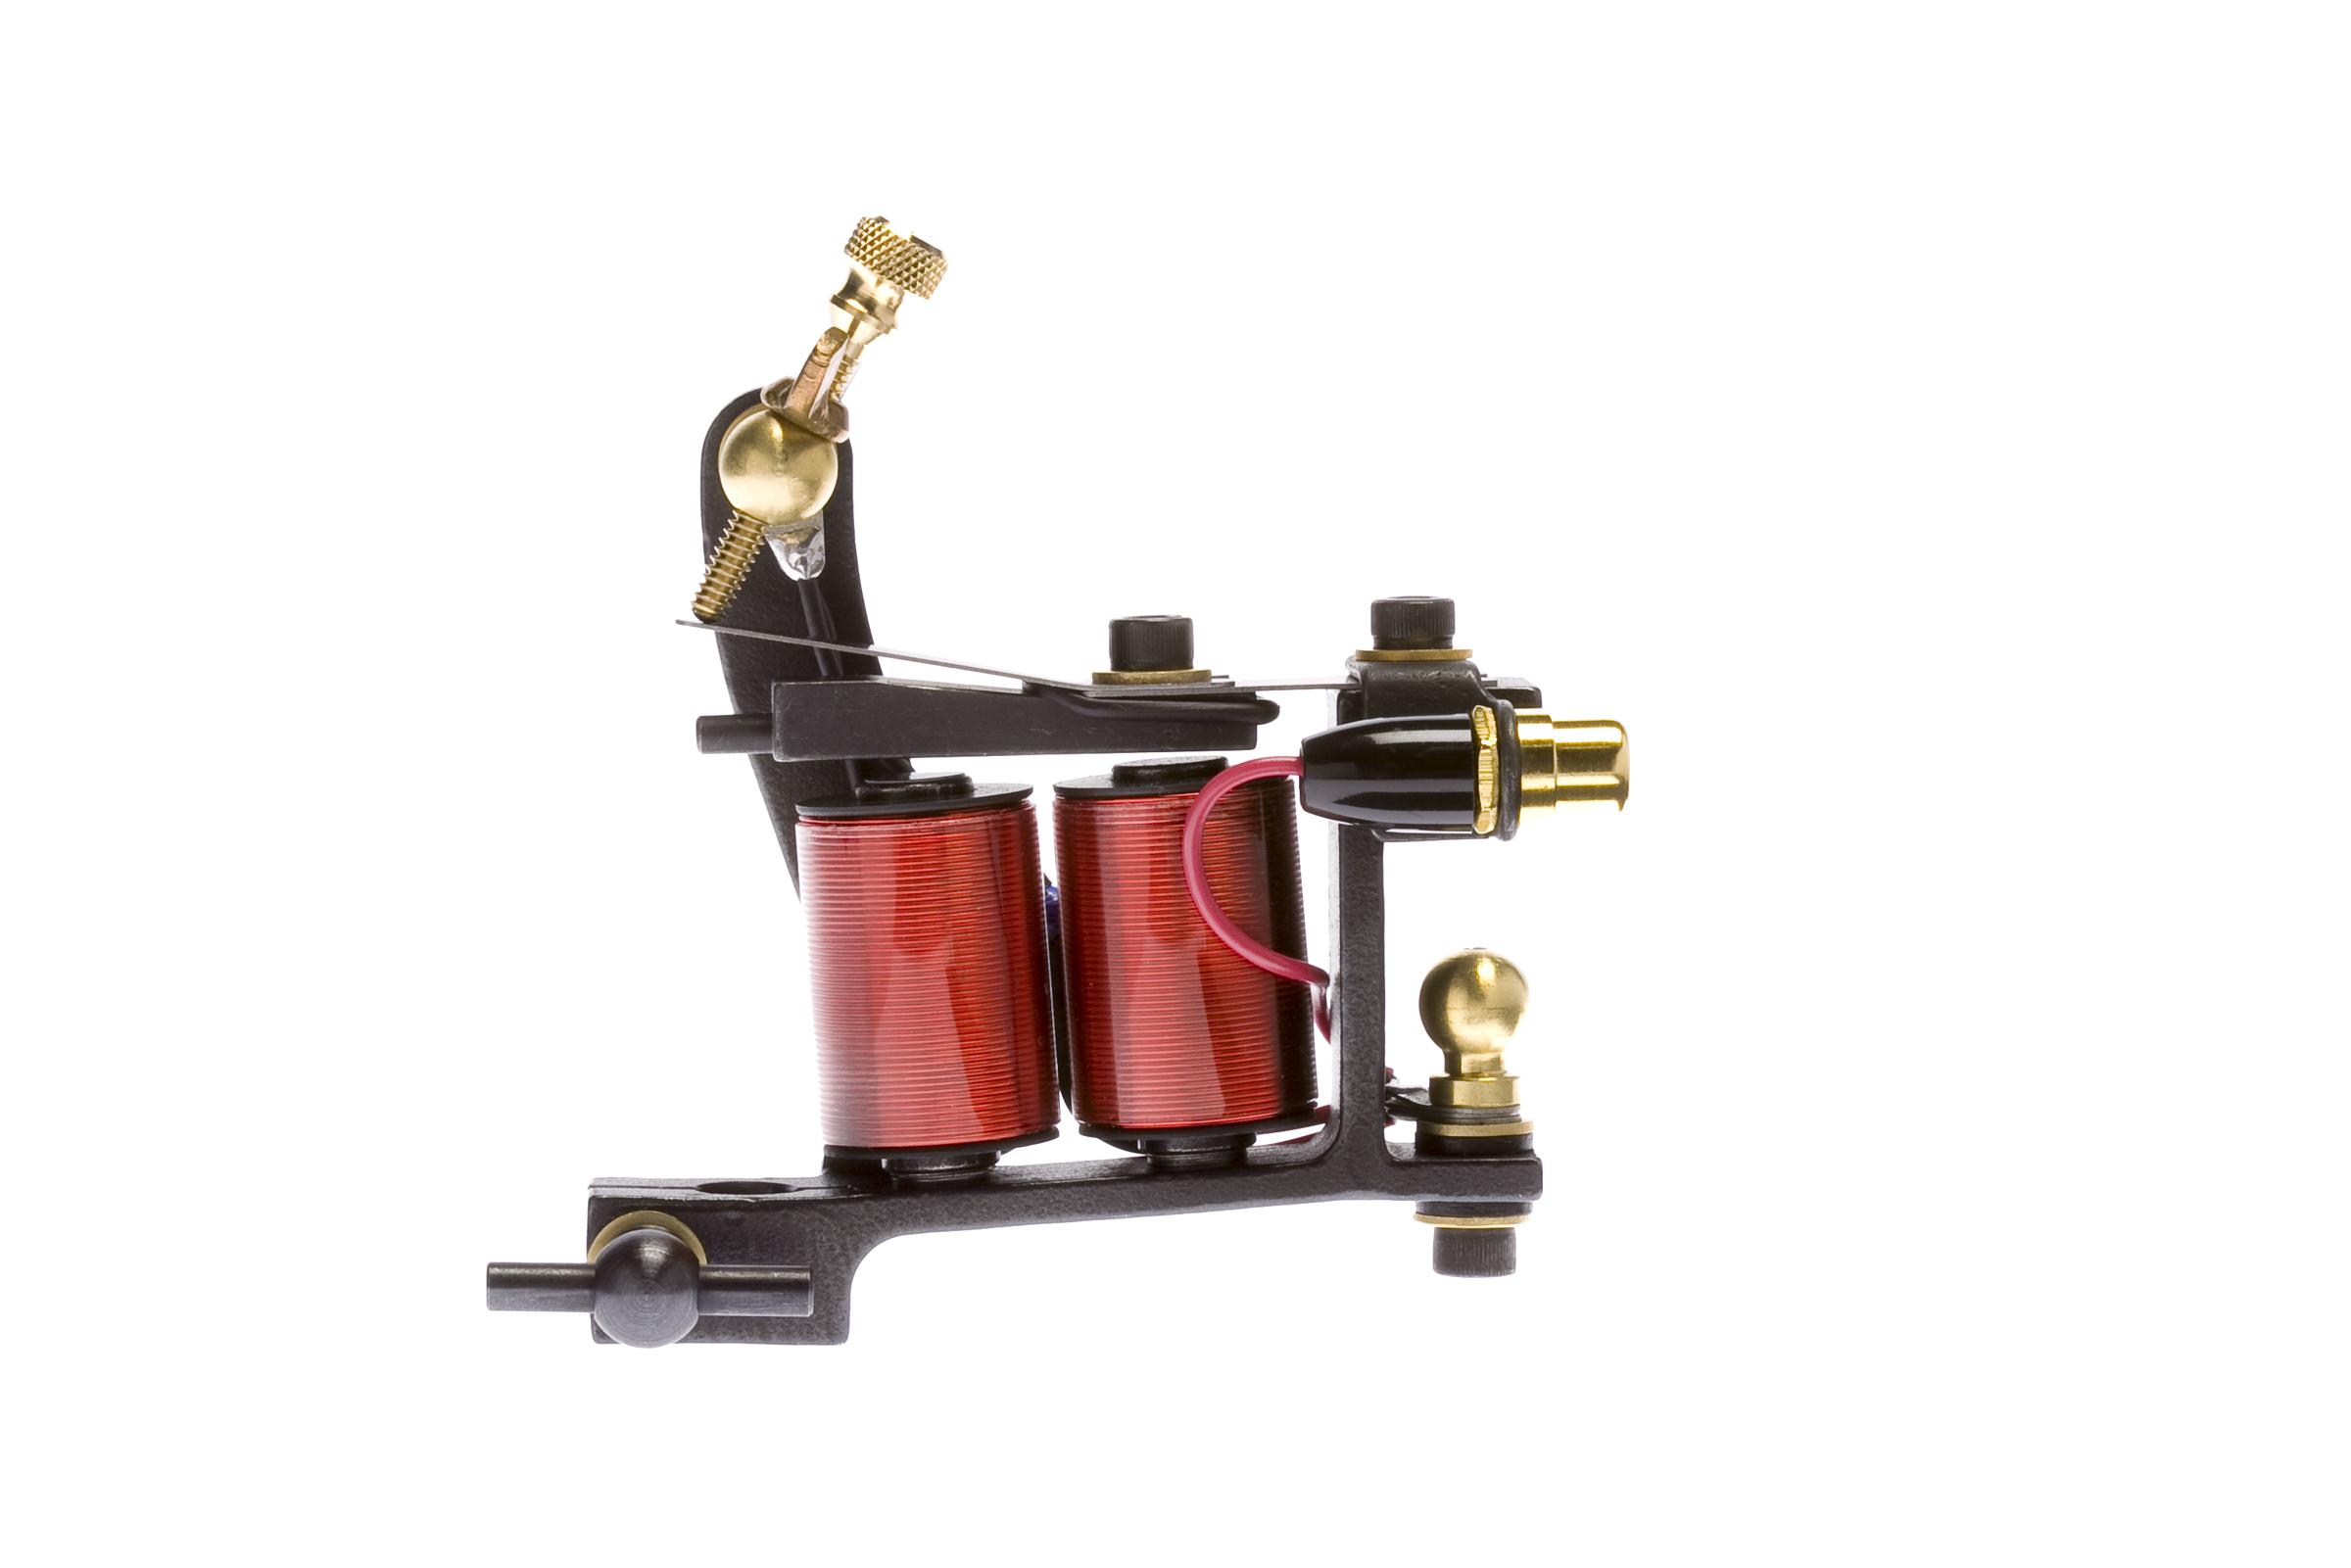 Laconia Machine - Coloring - Steel-2523-2